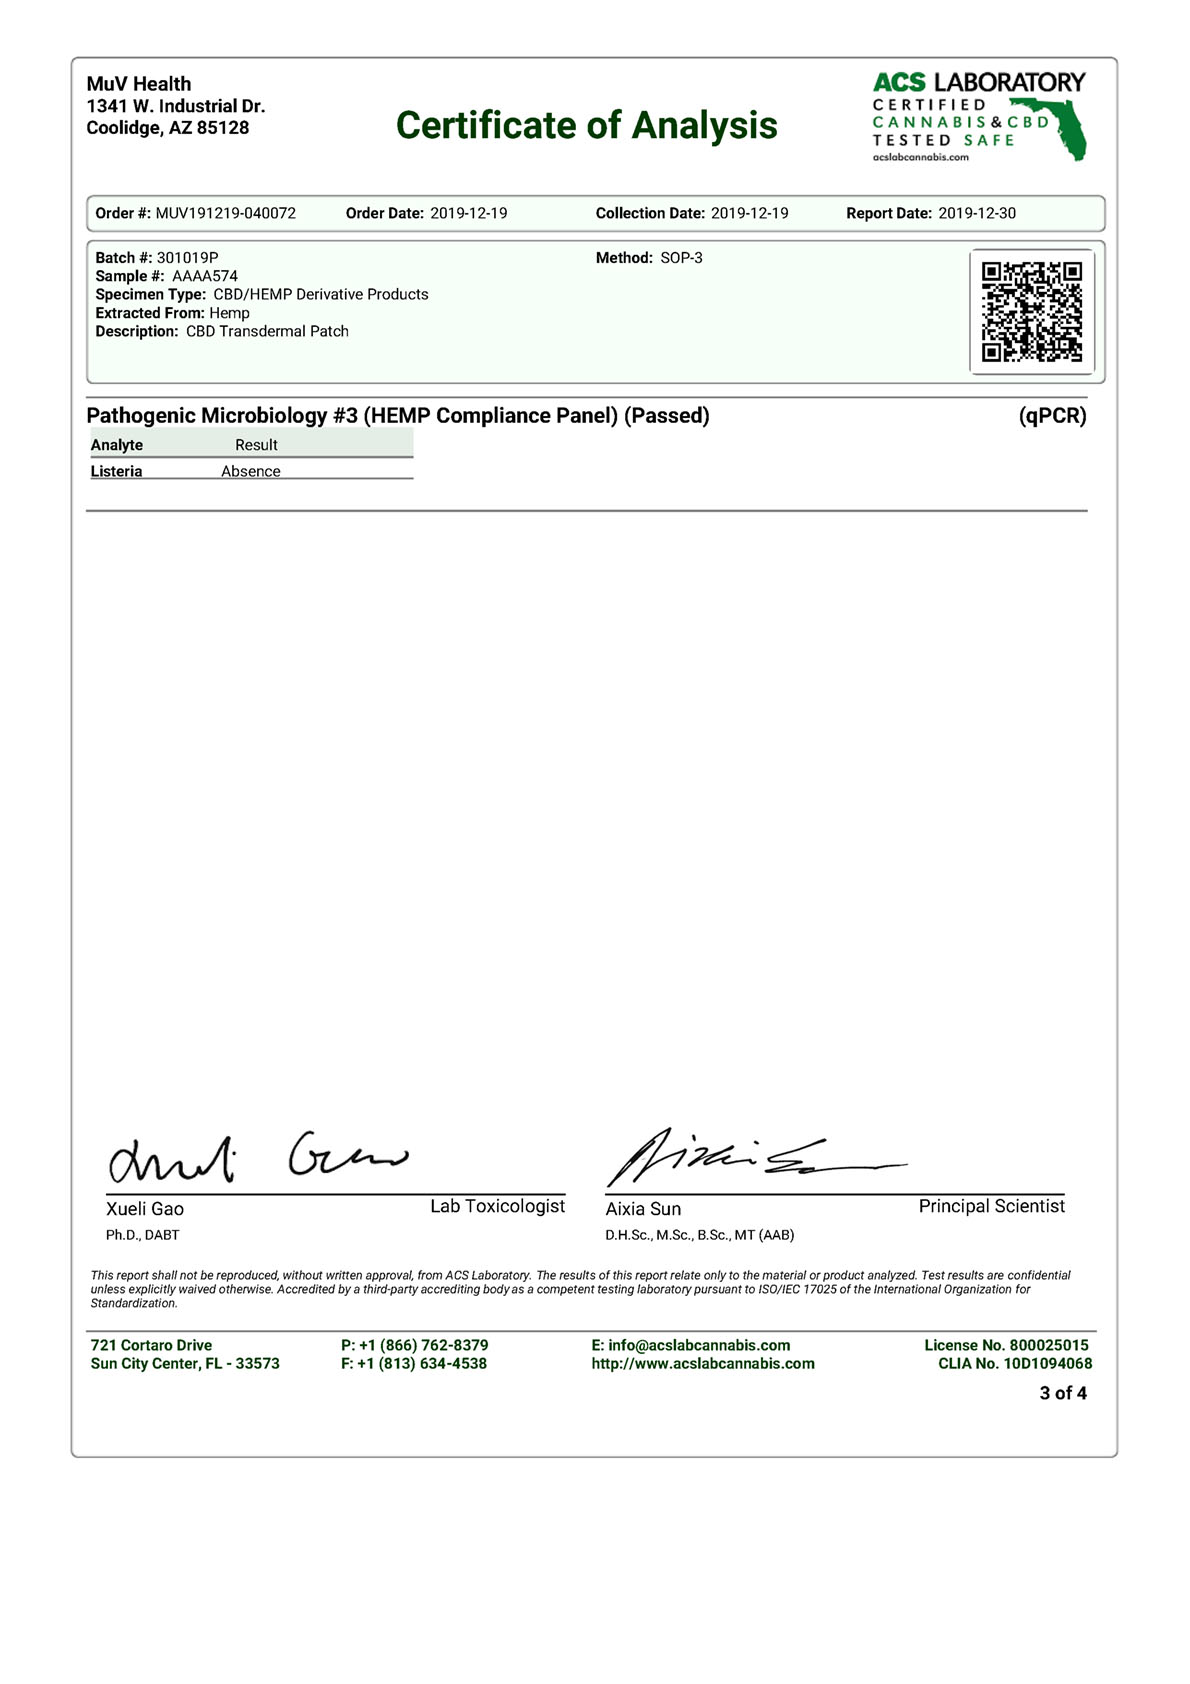 muv-cbd-transdermal-patch-coa-301019p-page-3.jpg